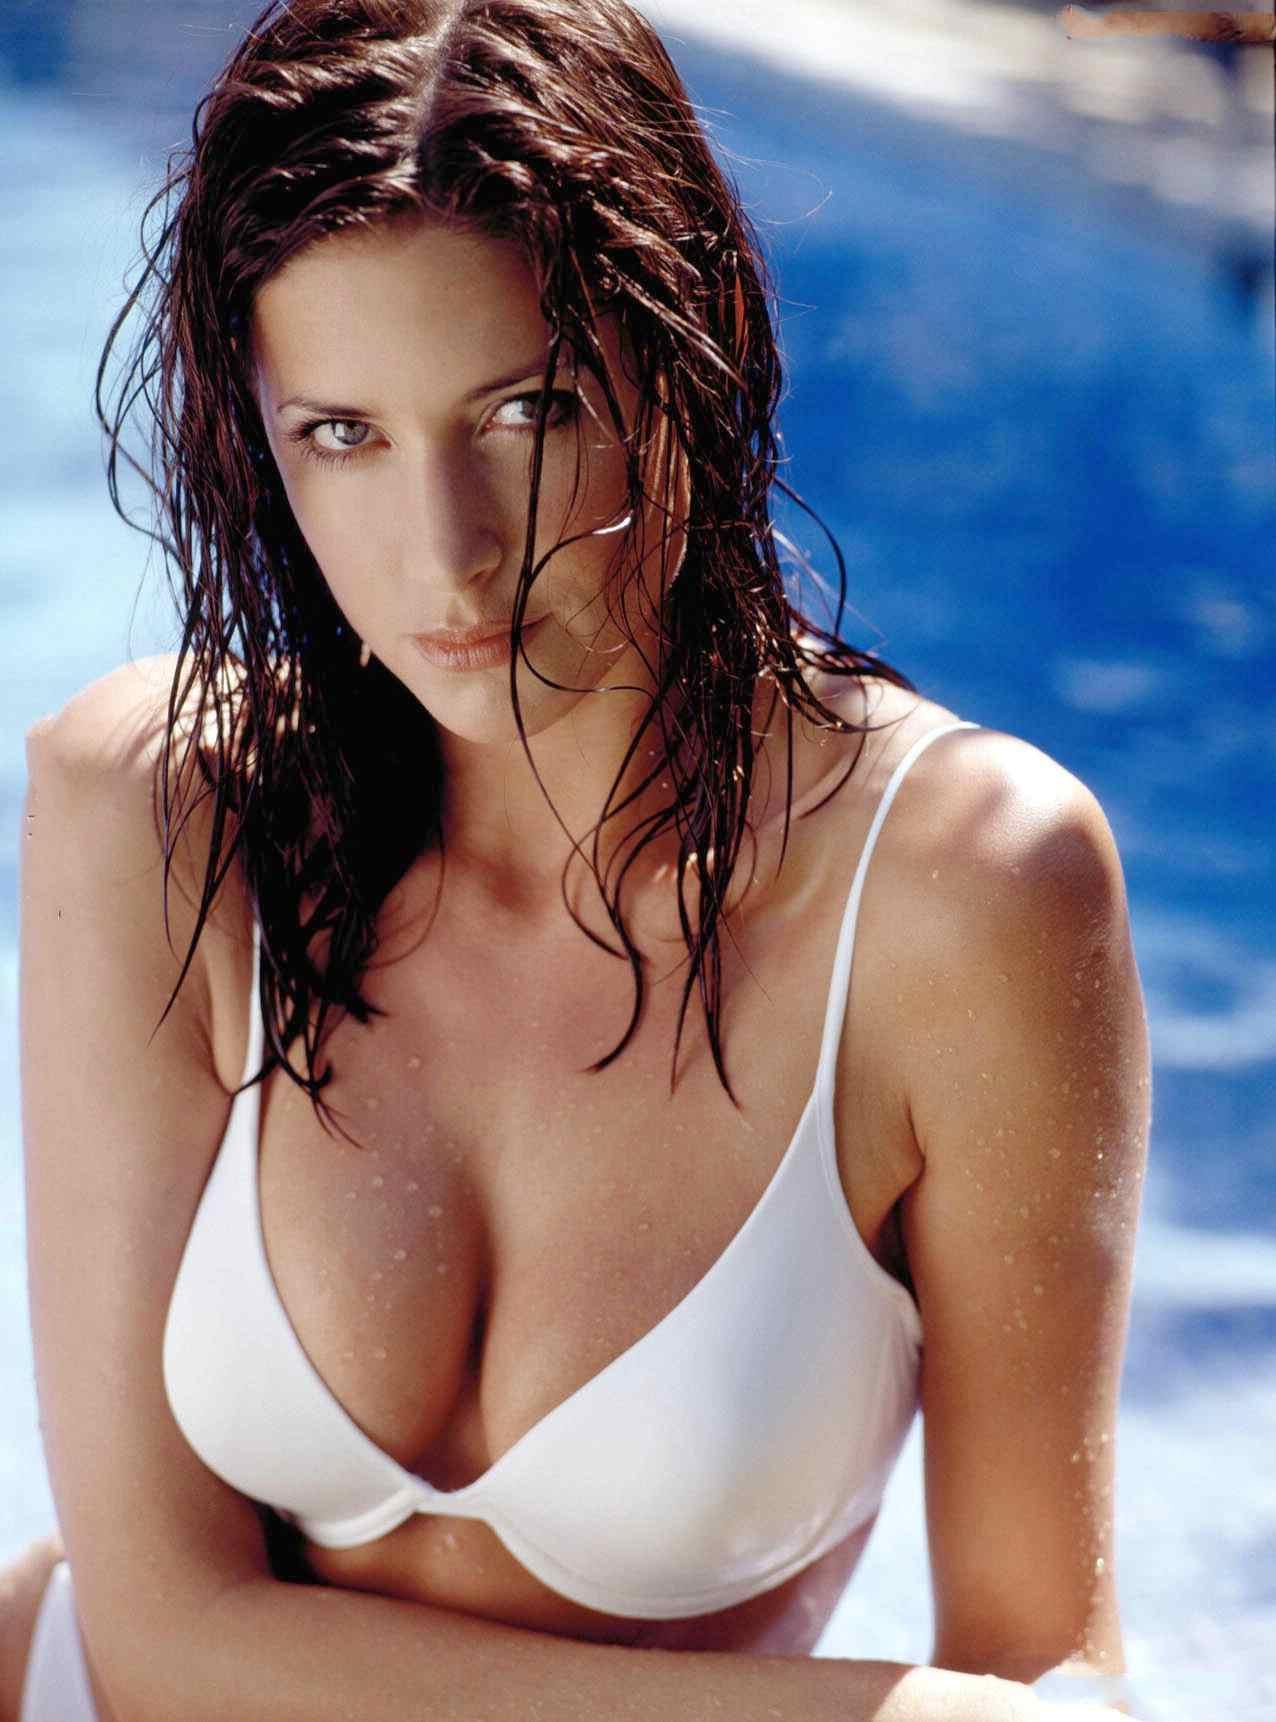 Katrina Kaif Sexy Plump Navel Boob Curves Hot Cleavage -1764